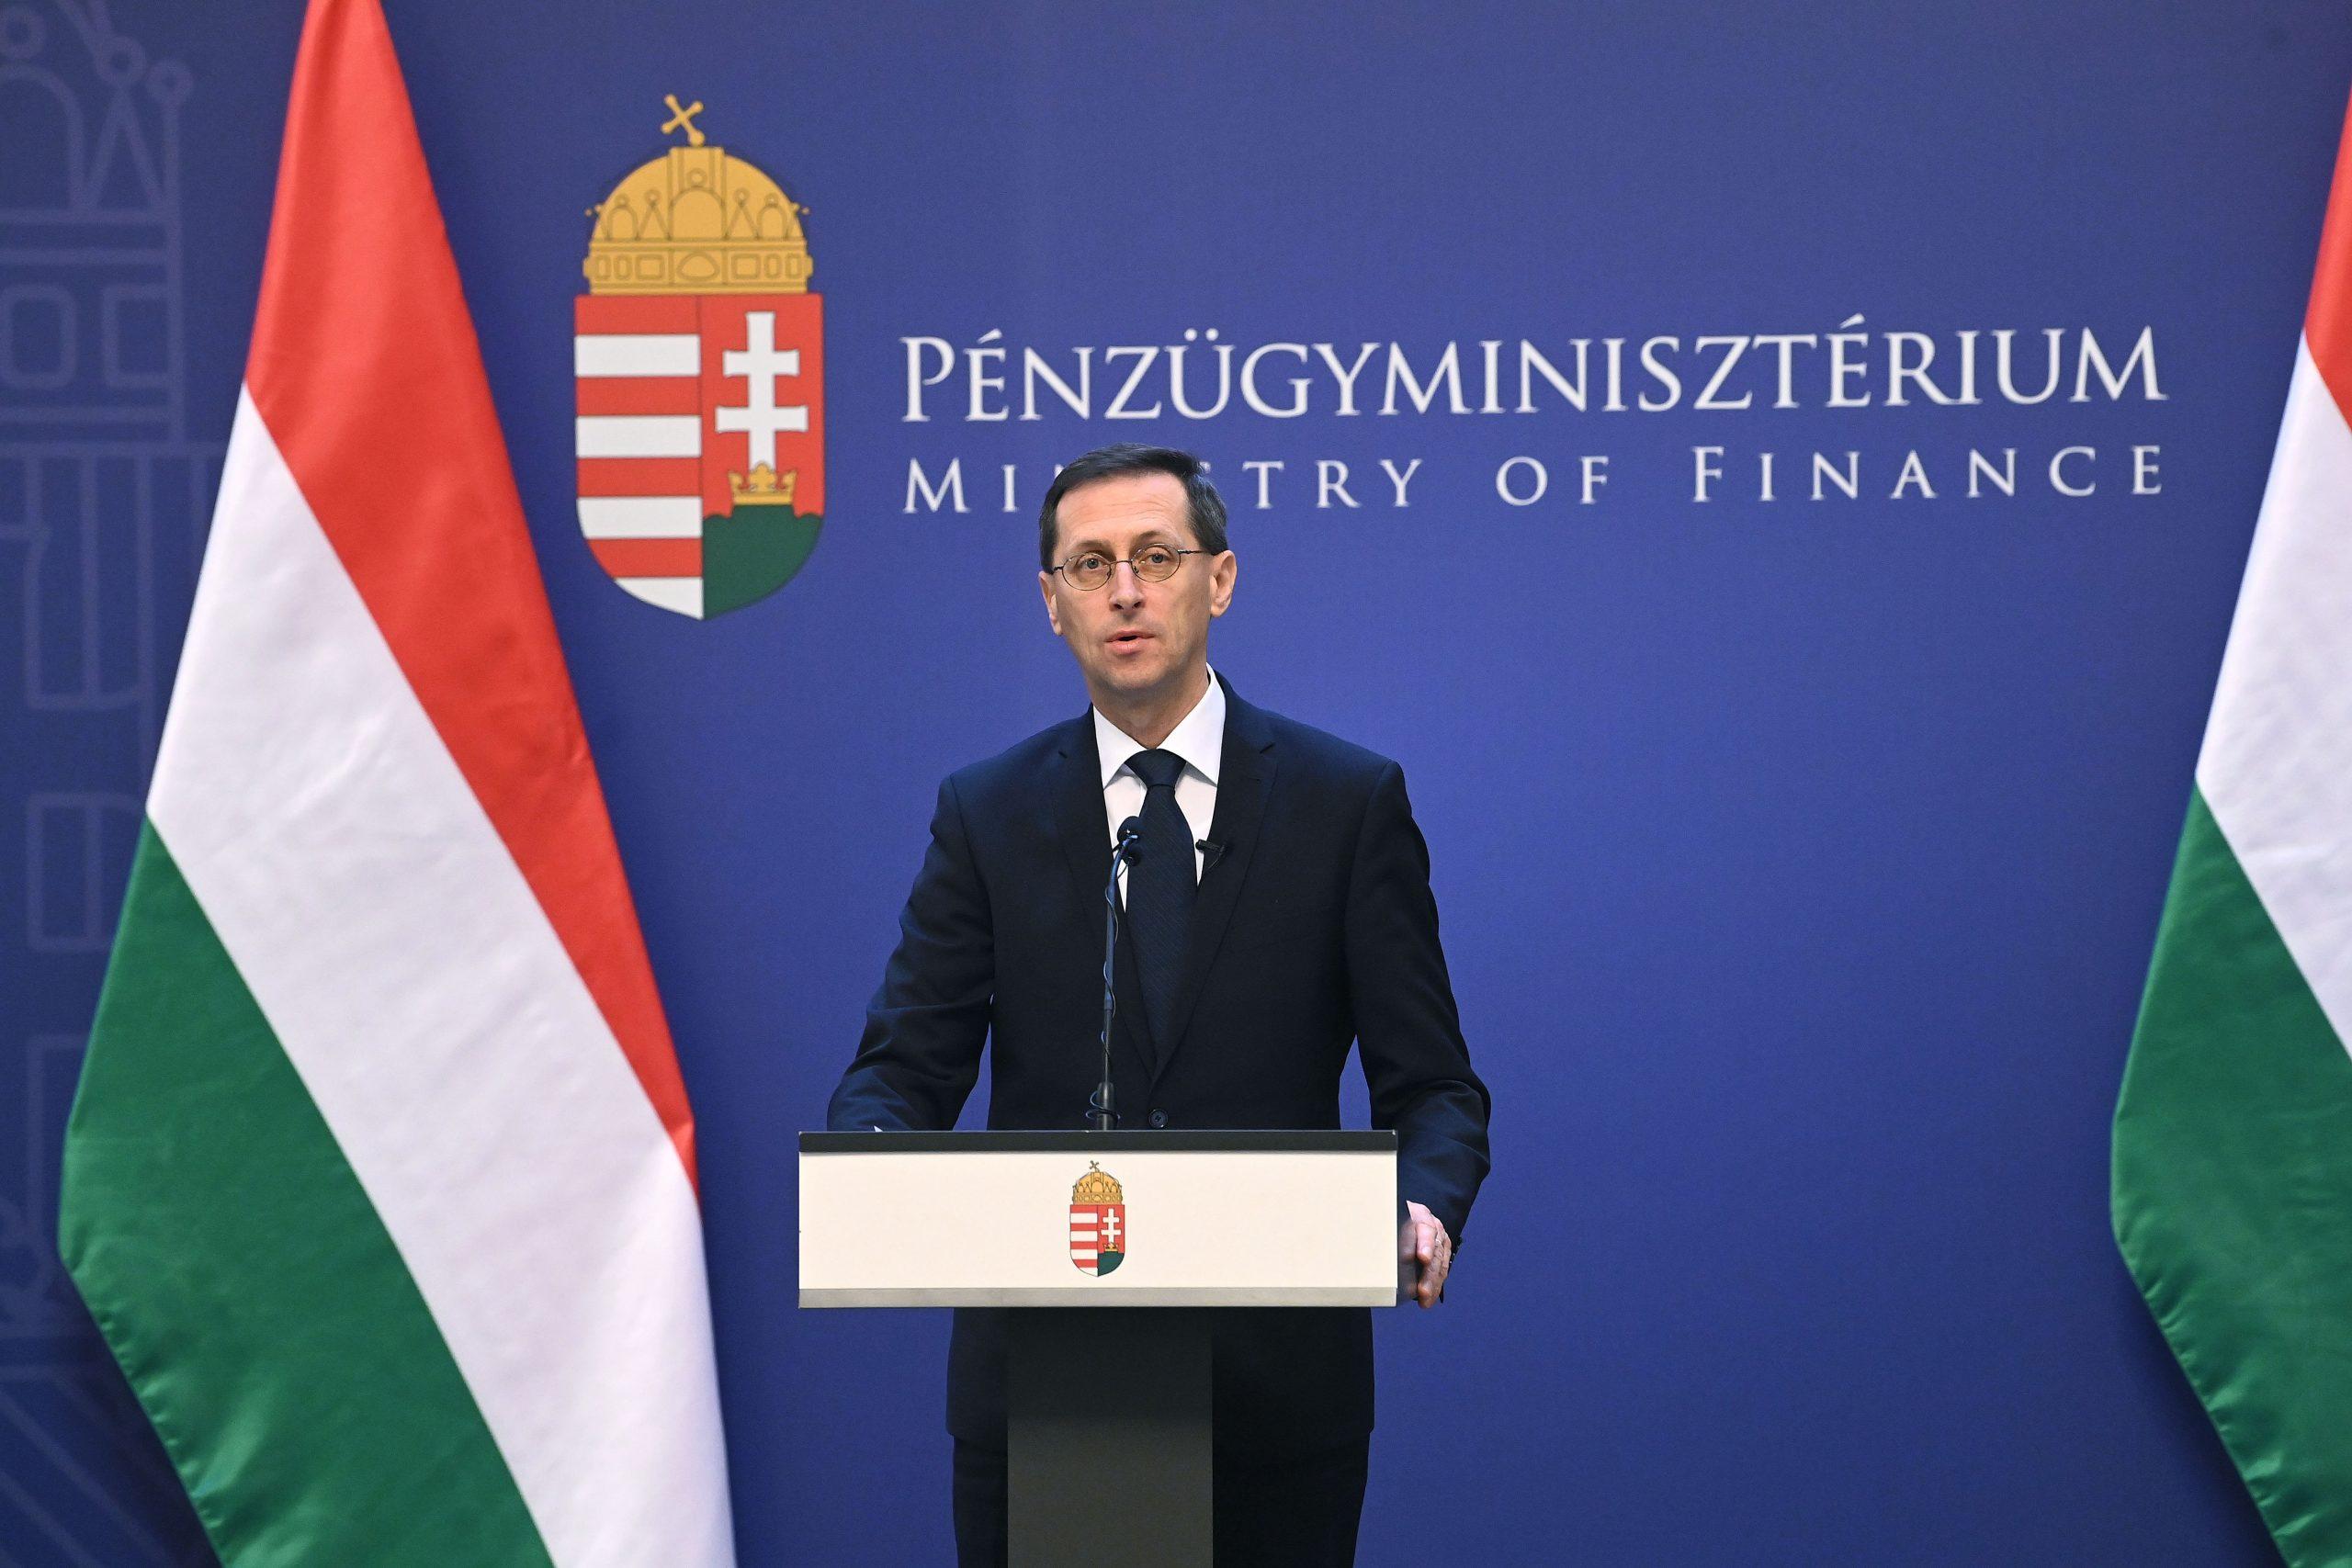 Finance Minister: Hungary to Lead EU's Post-Covid Economic Rebound